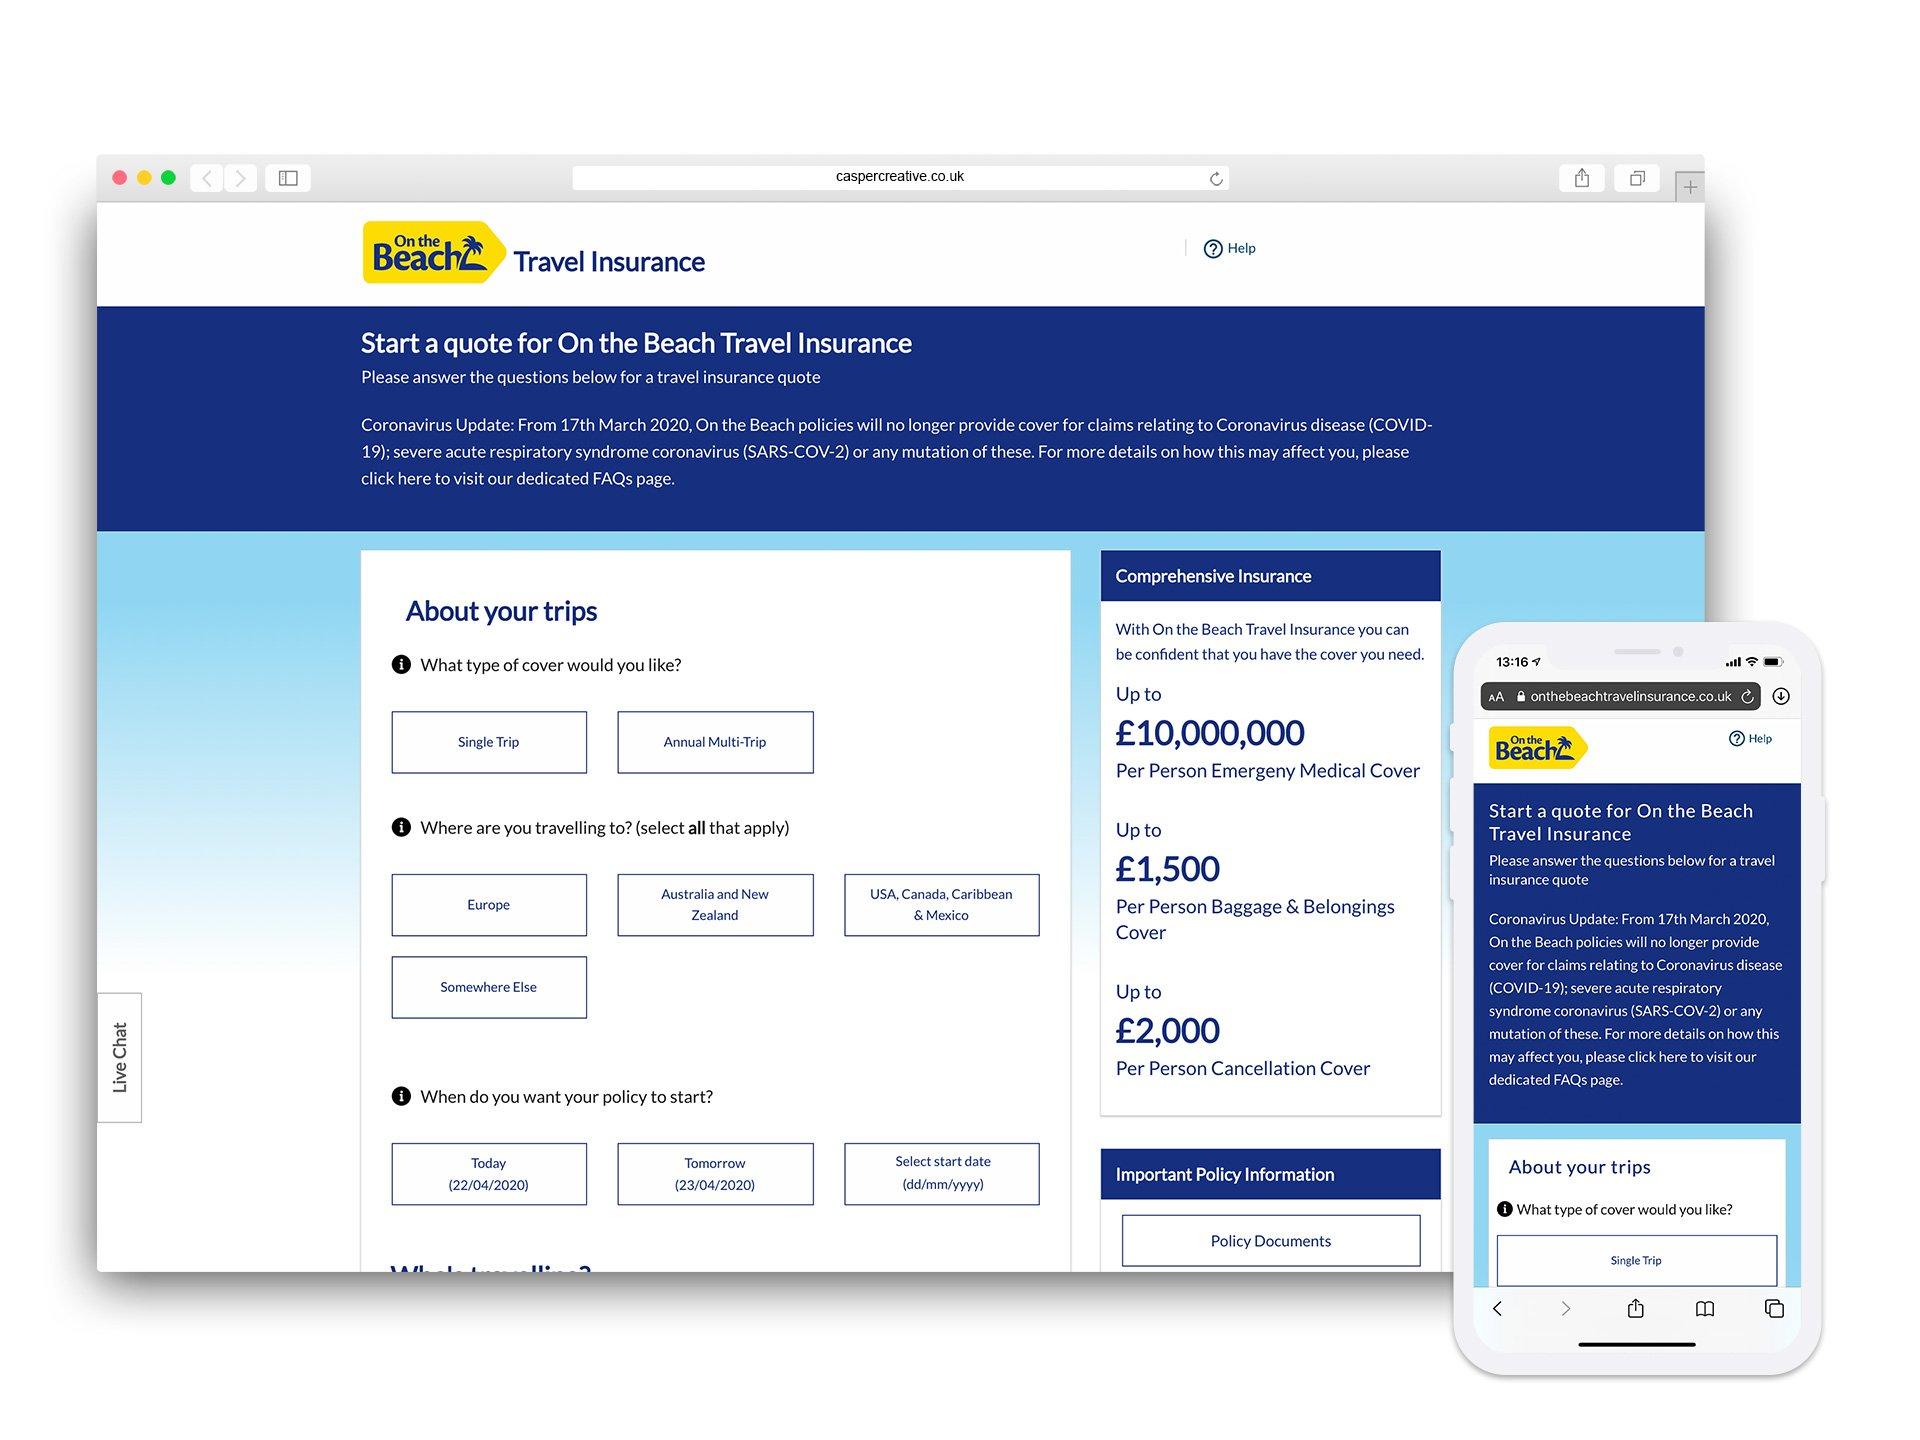 OnTheBeach Travel Insurance Website - Designed for ROCK Insurance Group by Casper Creative